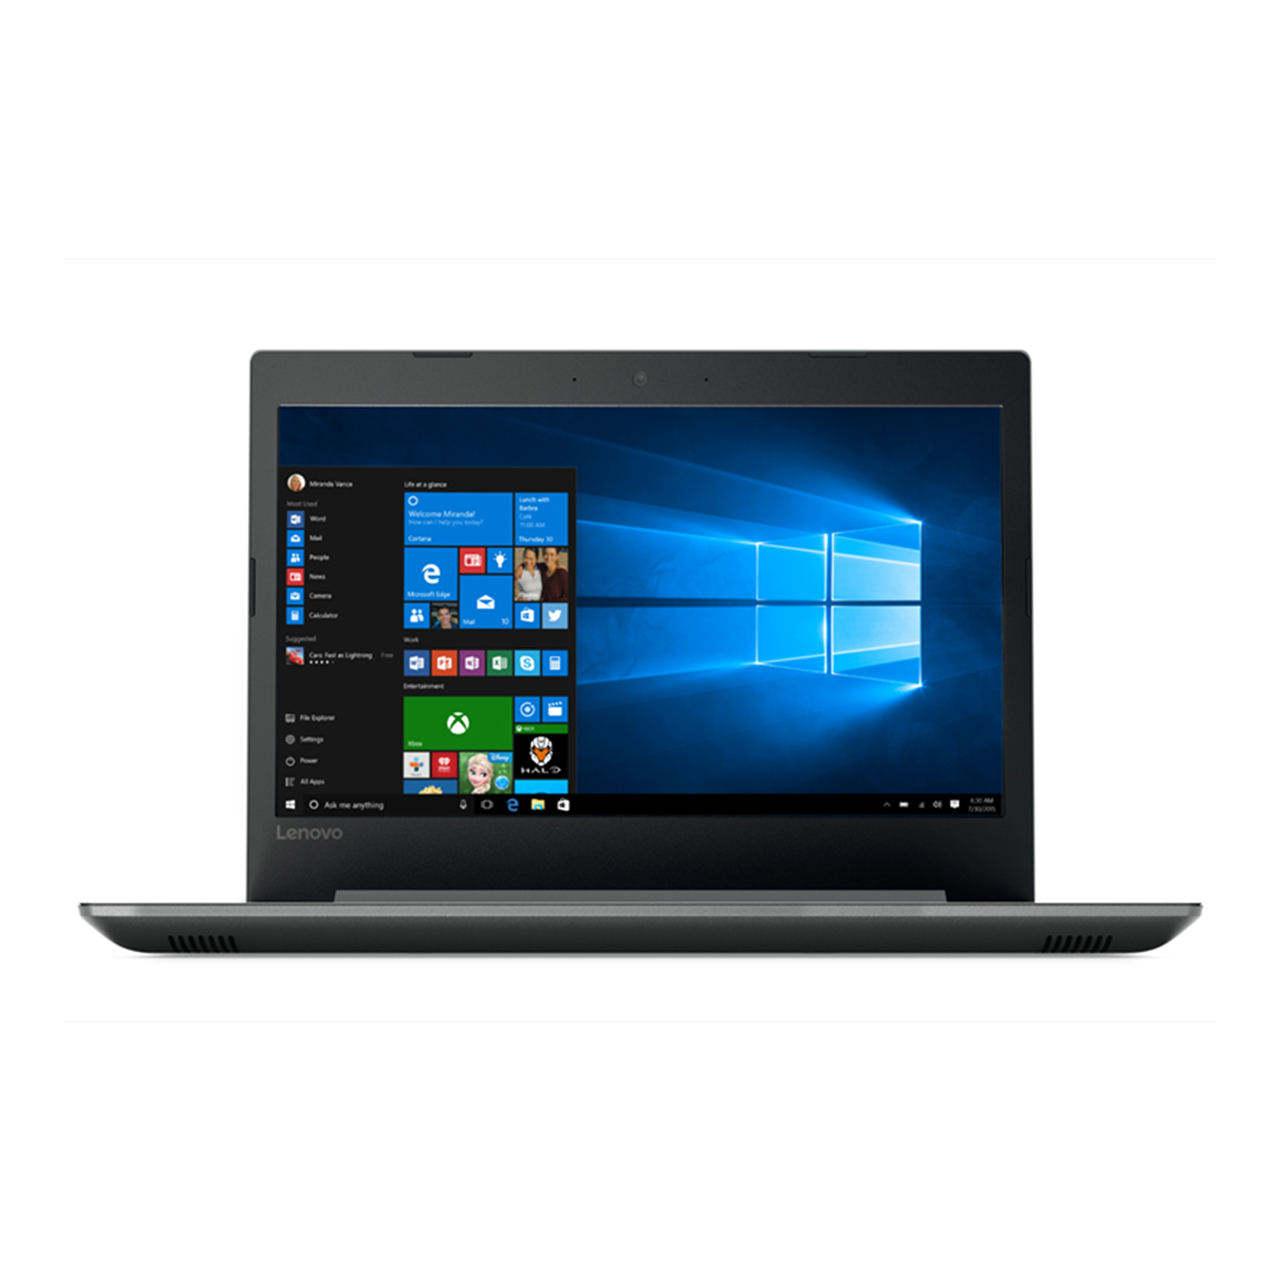 لپ تاپ 15 اینچی لنوو مدل Ideapad 330 - T